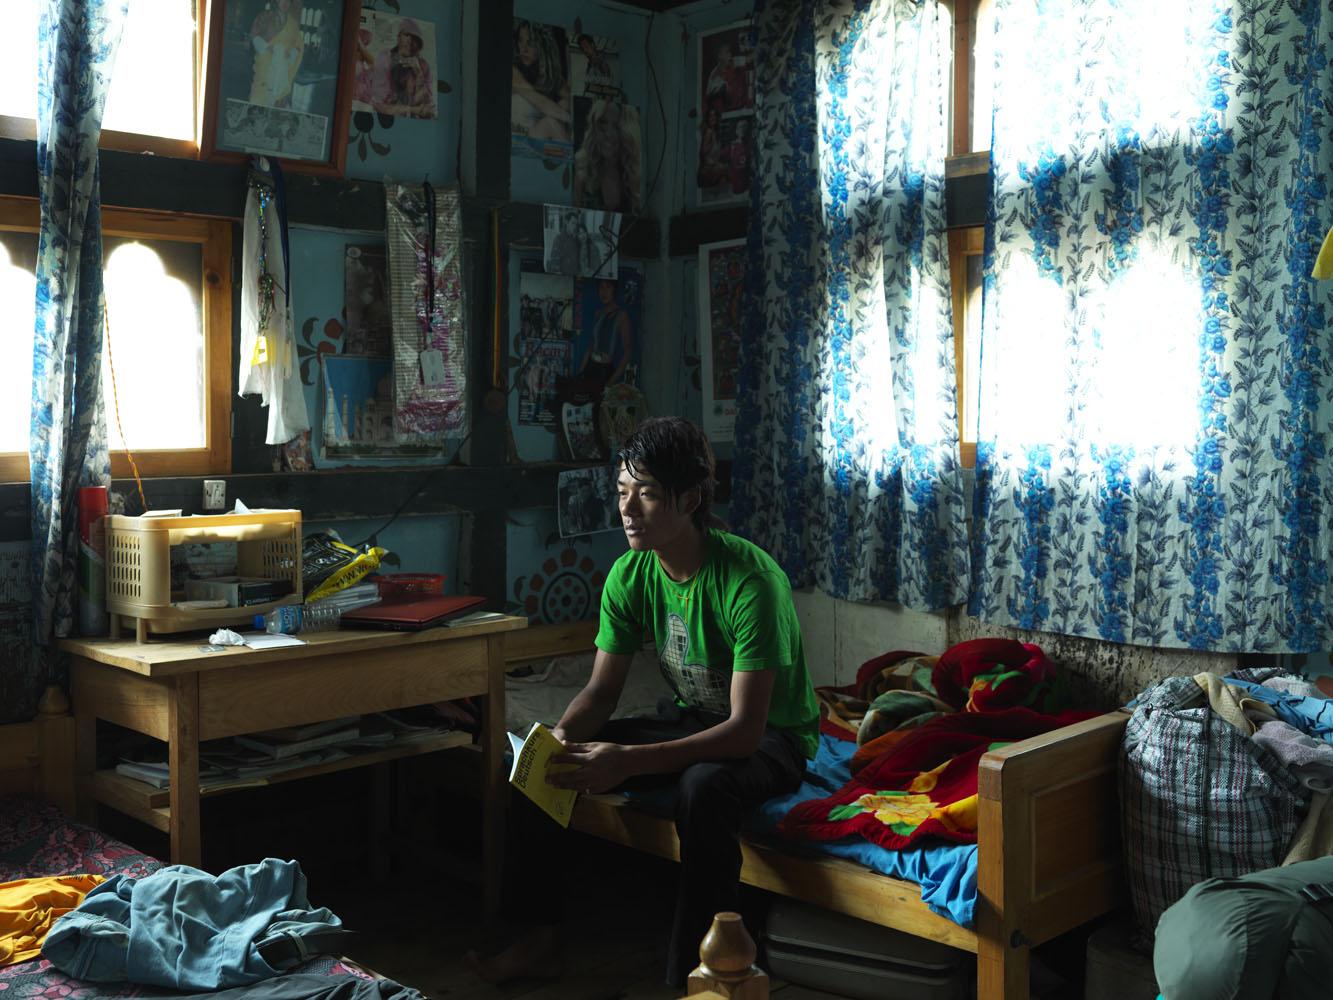 Sonam Wangchuck, a student, in Paro.